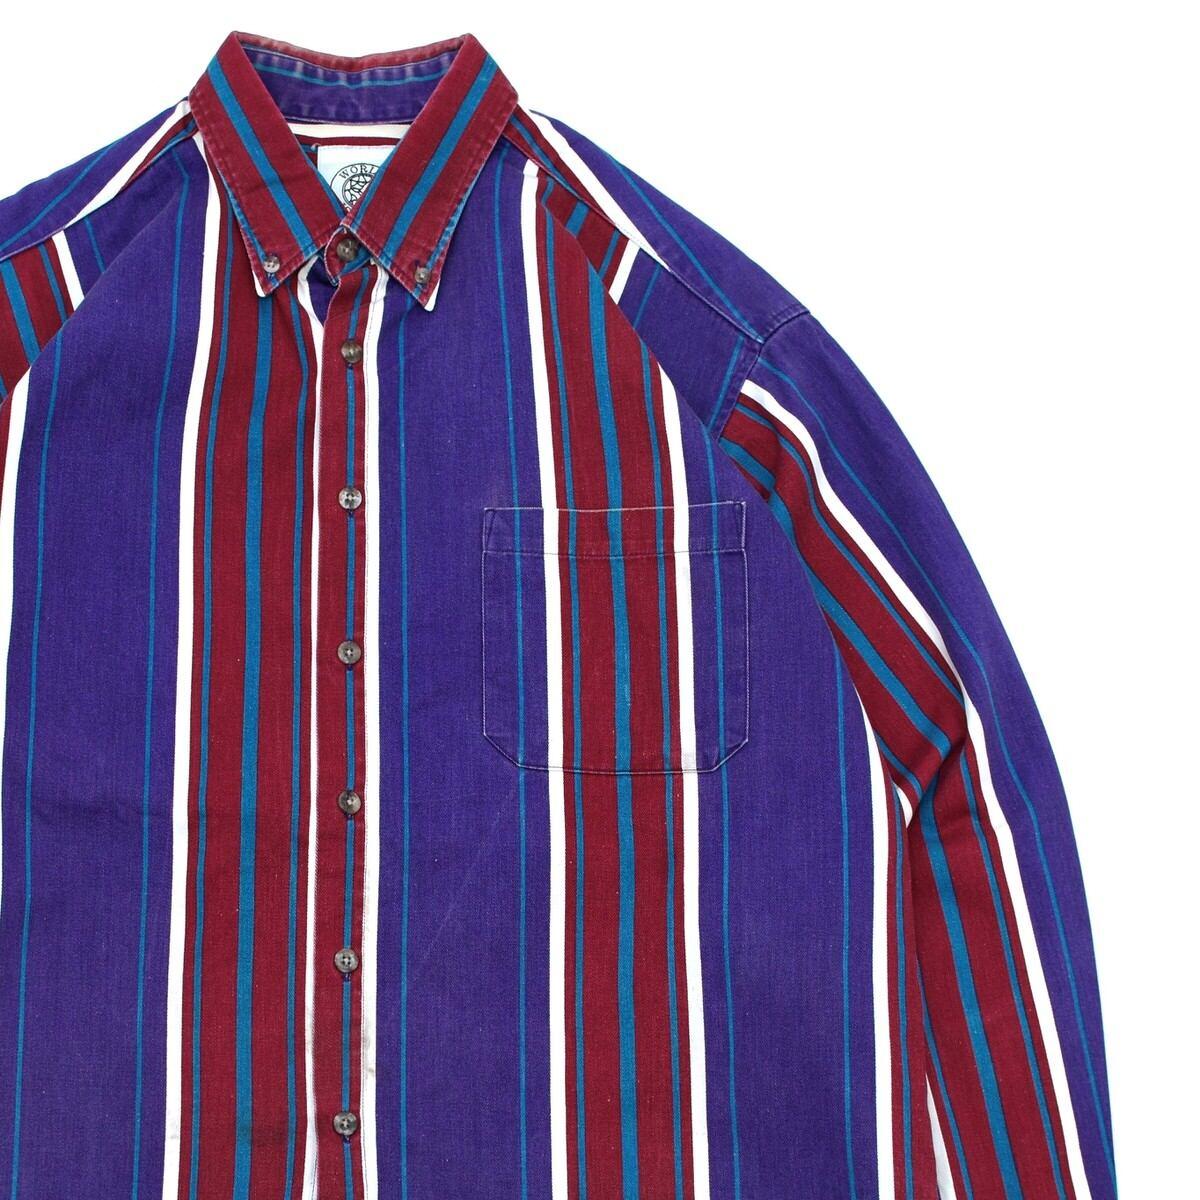 Made in USA multi stripe shirt